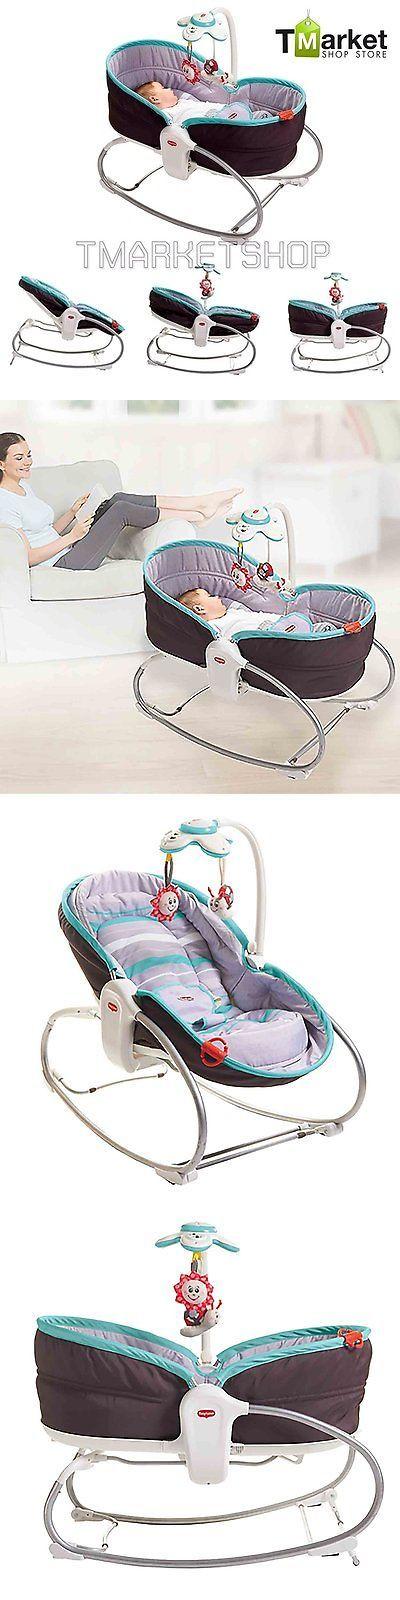 Nursery Bedding Sets 162040: 3 In 1 Baby Rocker-Napper Bed Convertible Safe Toddler Infant Cot Diaper Nurser -> BUY IT NOW ONLY: $166.82 on eBay!